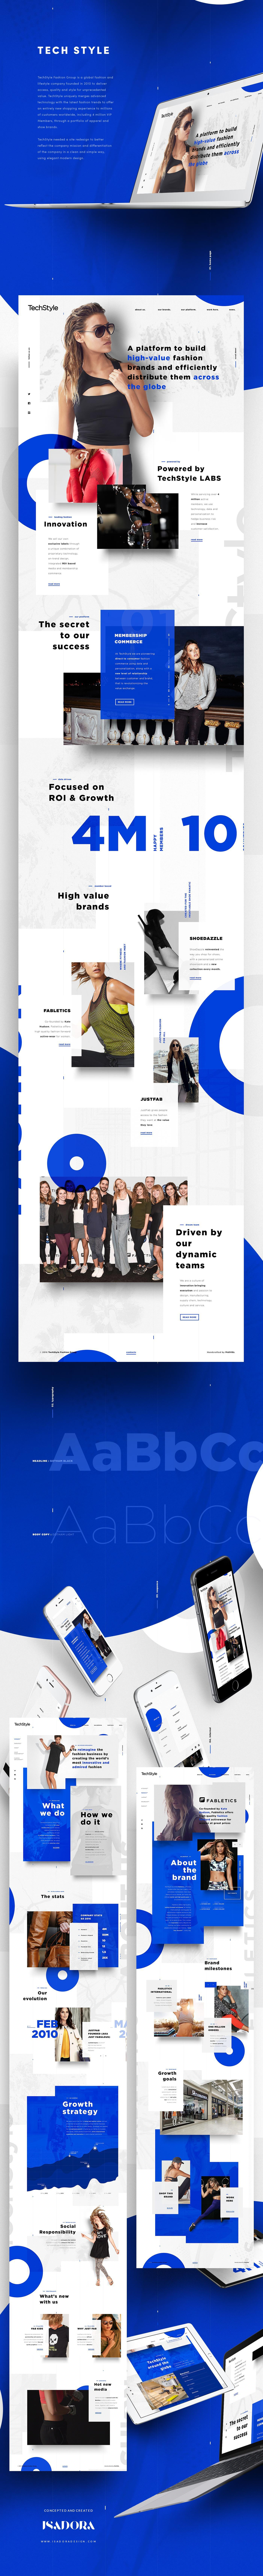 TechStyle - Corporate Investor Website